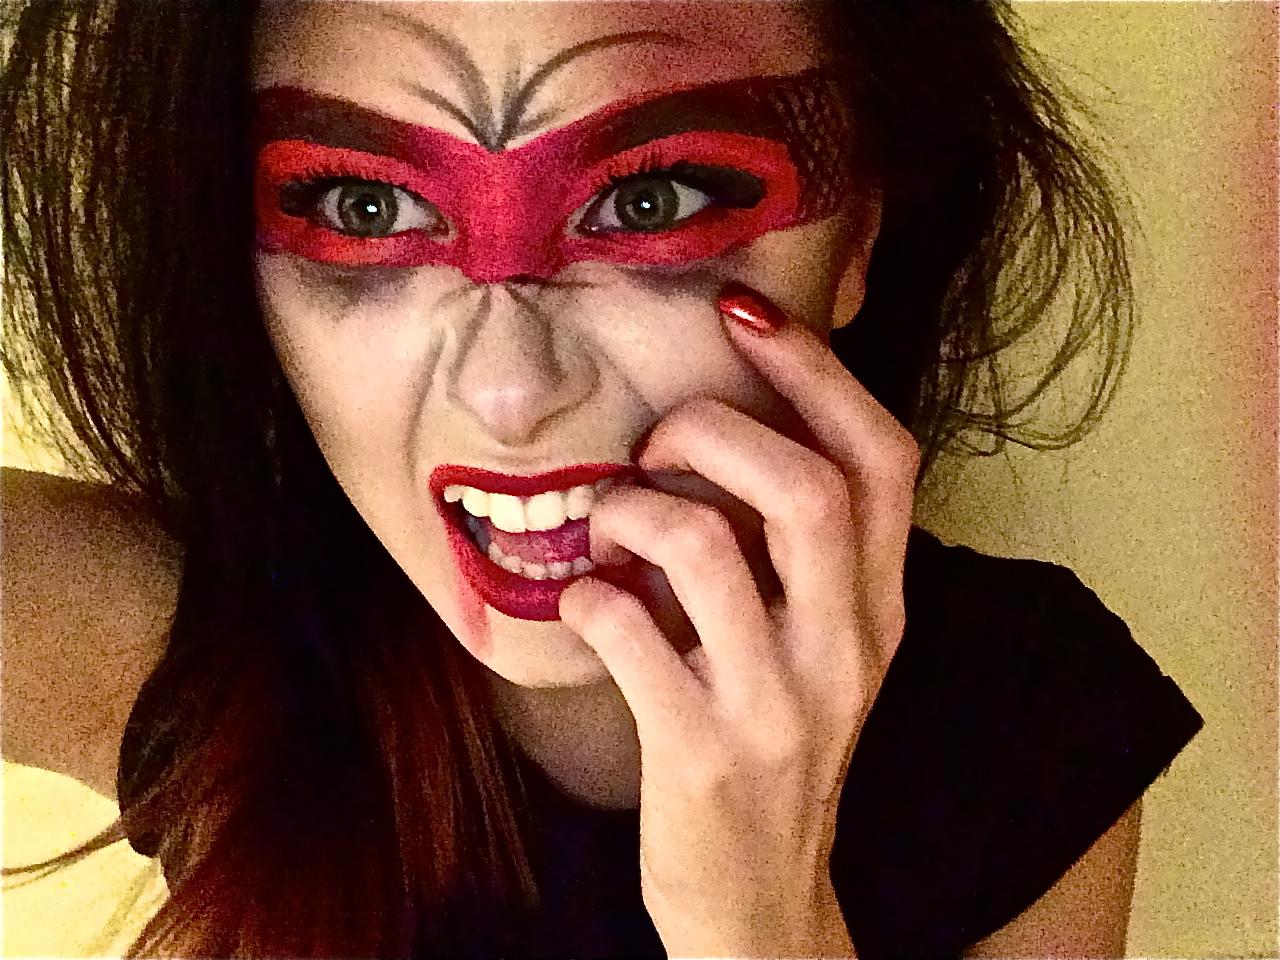 Halloween Makeup Devil Girl.Here S My Red Devil Masked Vombie Makeup Mashup Happy Halloween